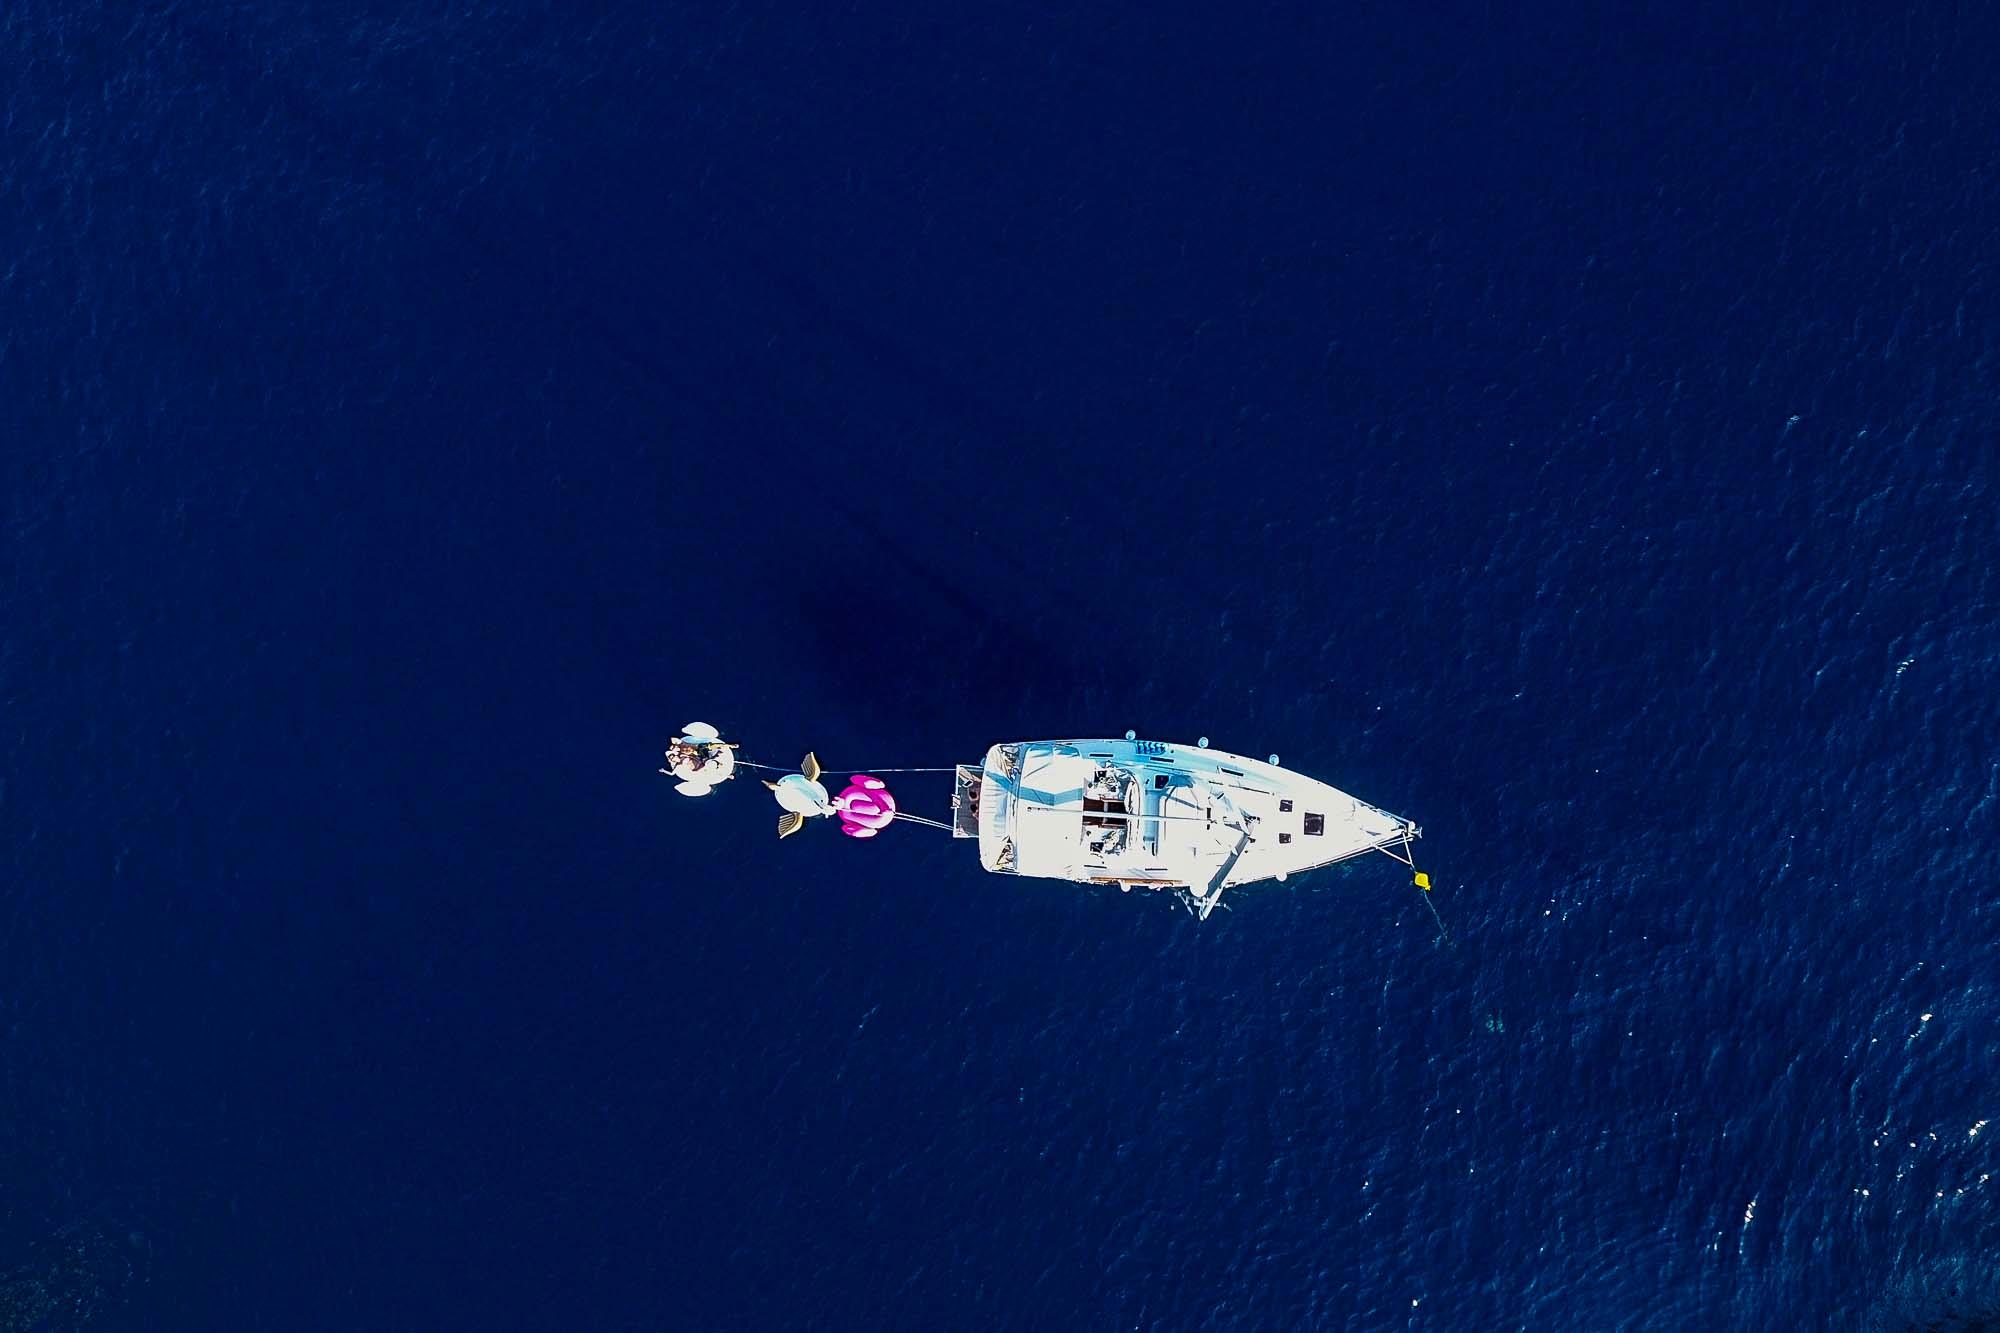 Dalmatia Sailing Aerials - Jus Medic